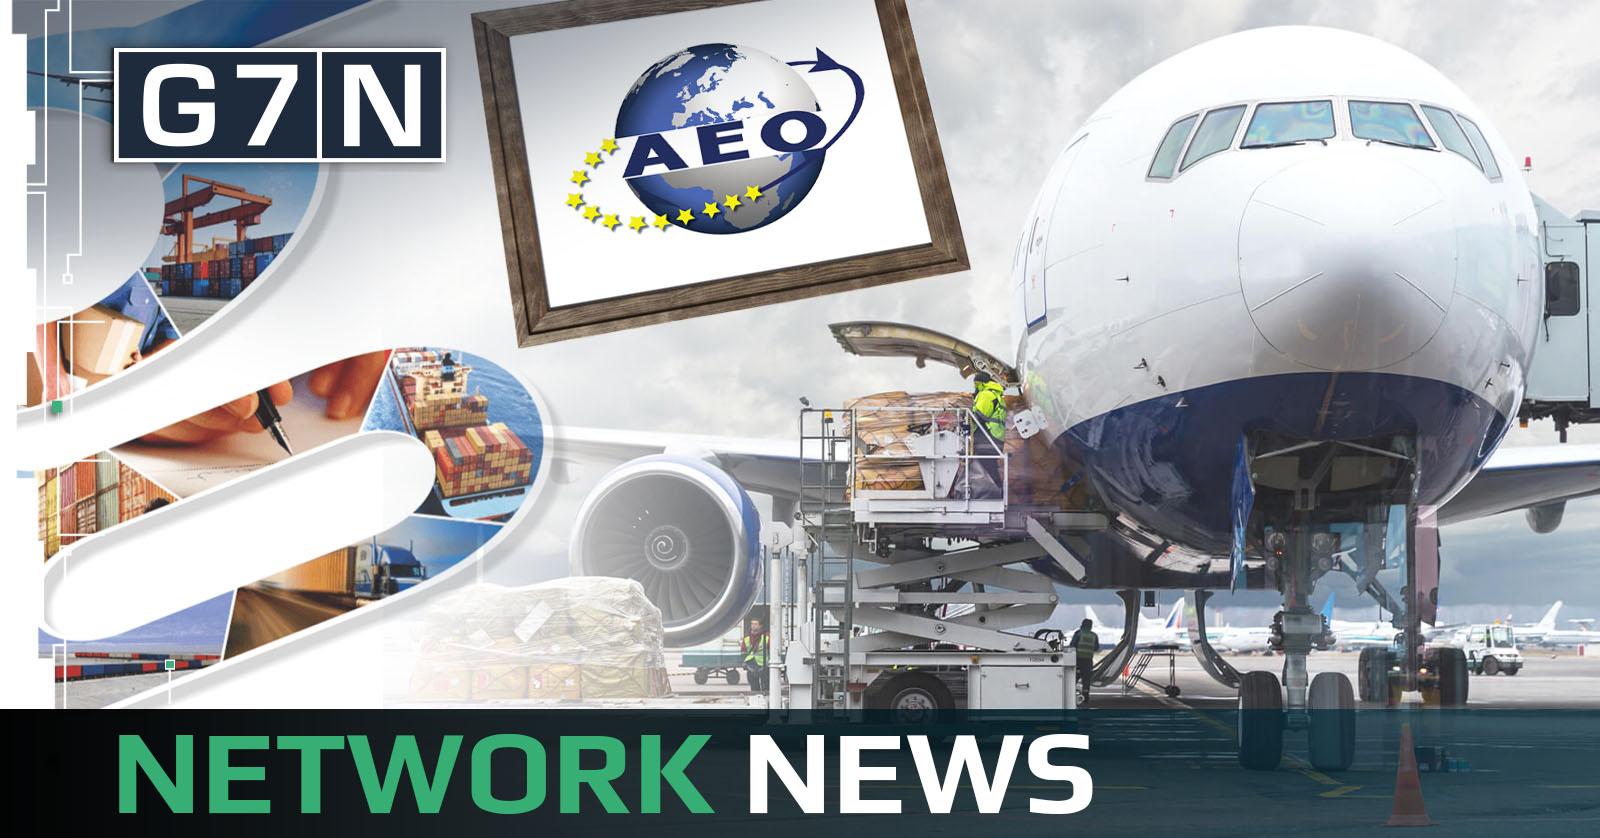 https://newg7dashboard.g7networks.com/news/news__220721_G7N_galax_NEWS.jpg